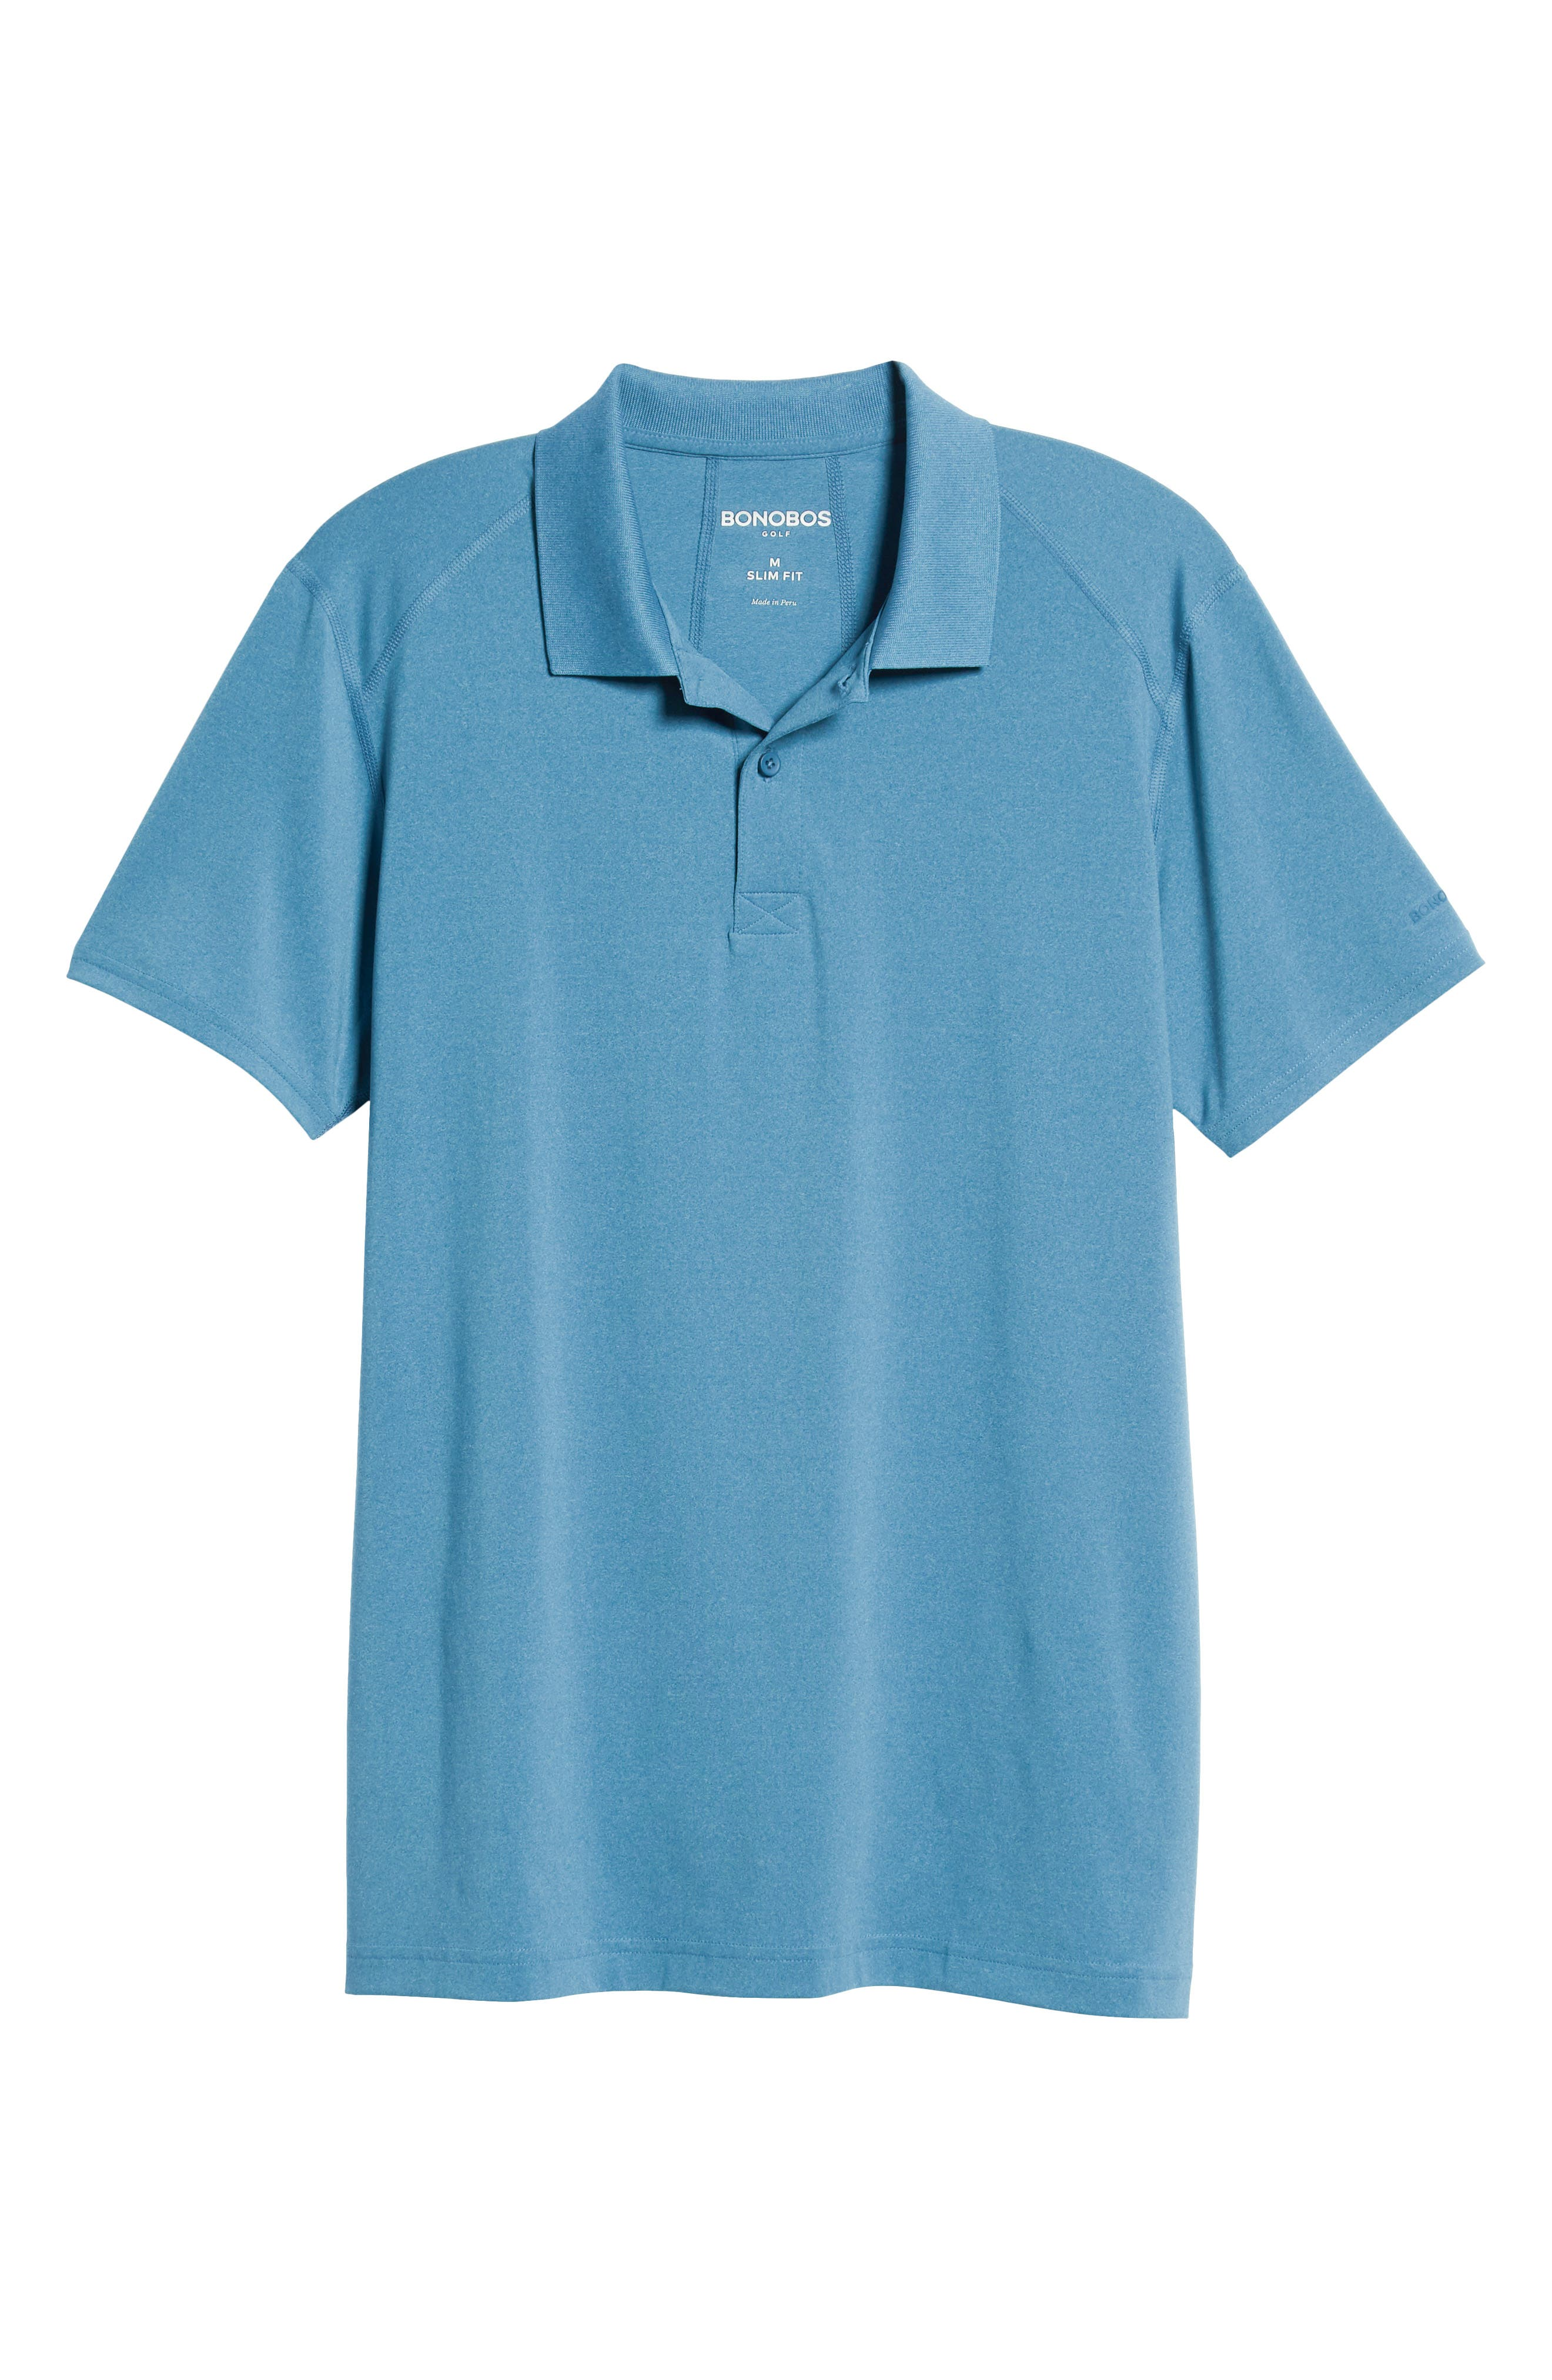 M-Flex Flatiron Slim Fit Golf Polo,                             Alternate thumbnail 6, color,                             HEATHERED BLUE